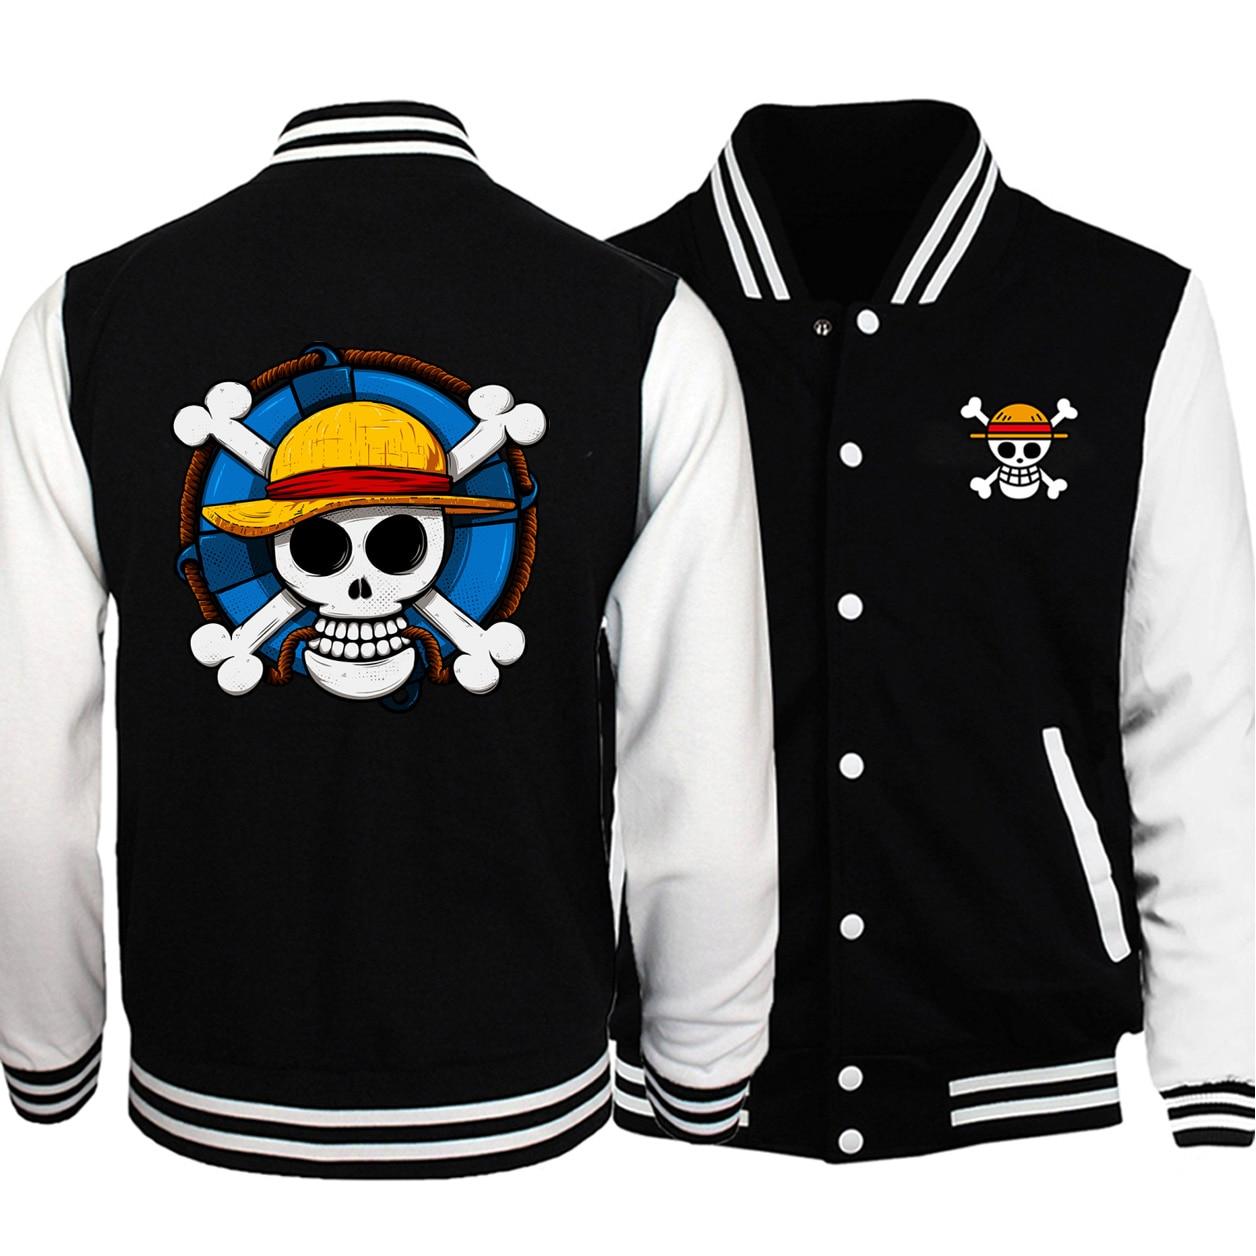 2019 Japón Anime una pieza mono D Luffy bandera pirata hombres béisbol uniforme chaqueta abrigo hombres caliente moda Fitness Casual chaquetas